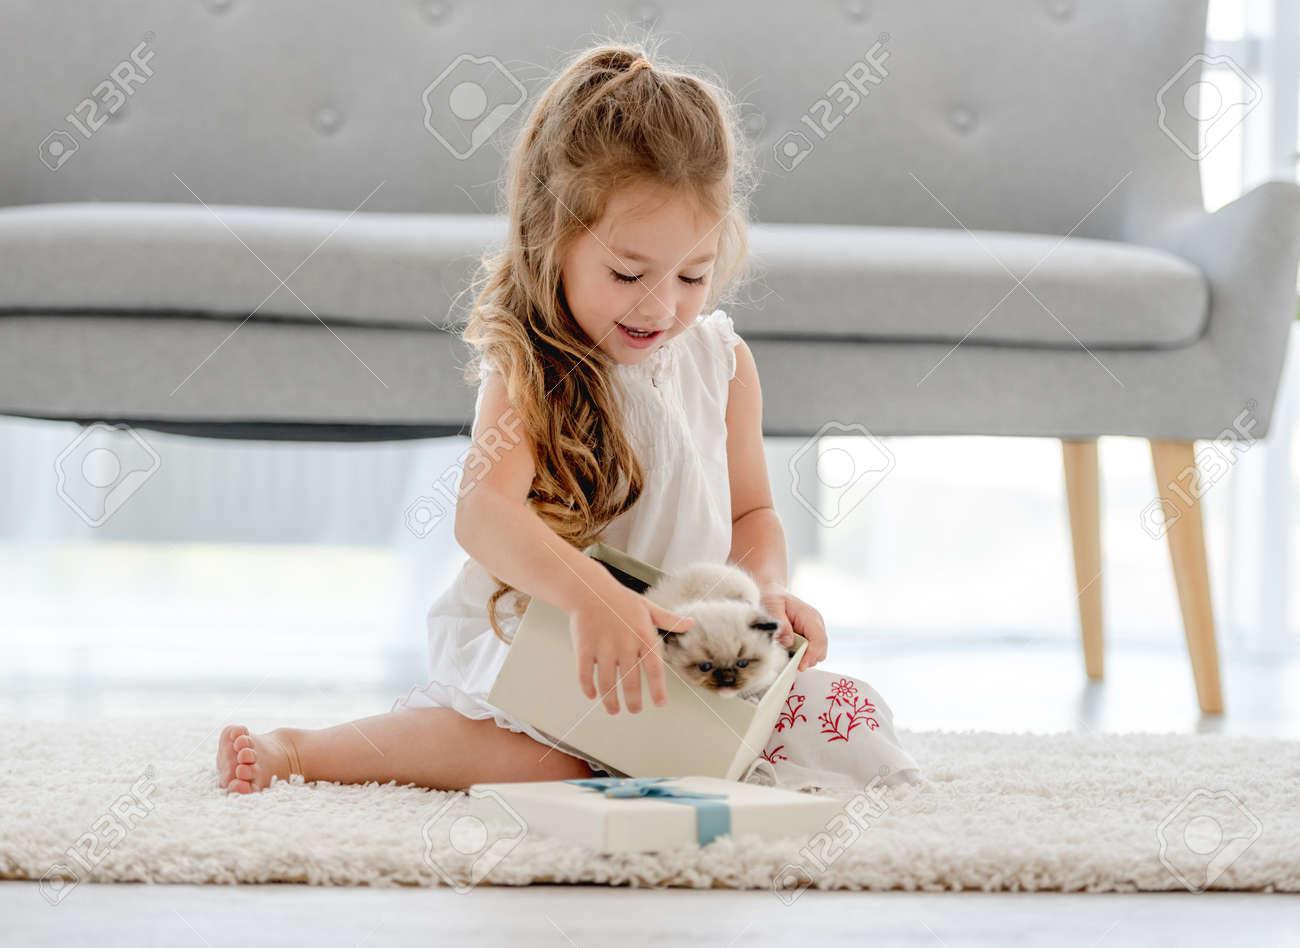 Girl with ragdoll kitten - 173455733